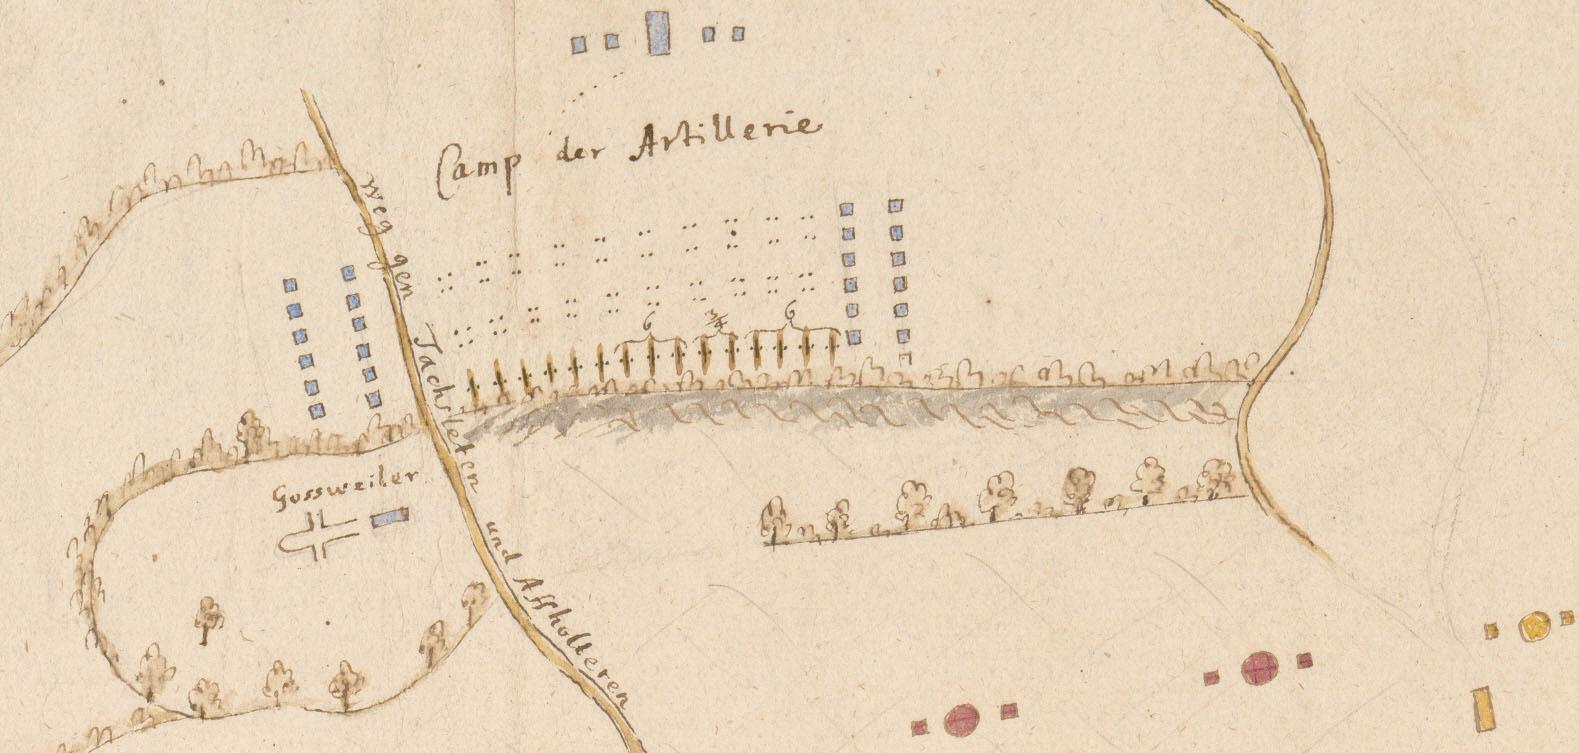 Zürcher Lager bei Mettmenstetten (Ausschnitt «Camp der Artillerie»): Johann Jakob Scheuchzer, handschriftlicher Situationsplan 1712. Abteilung Karten und Panoramen, Signatur: MK 2179.